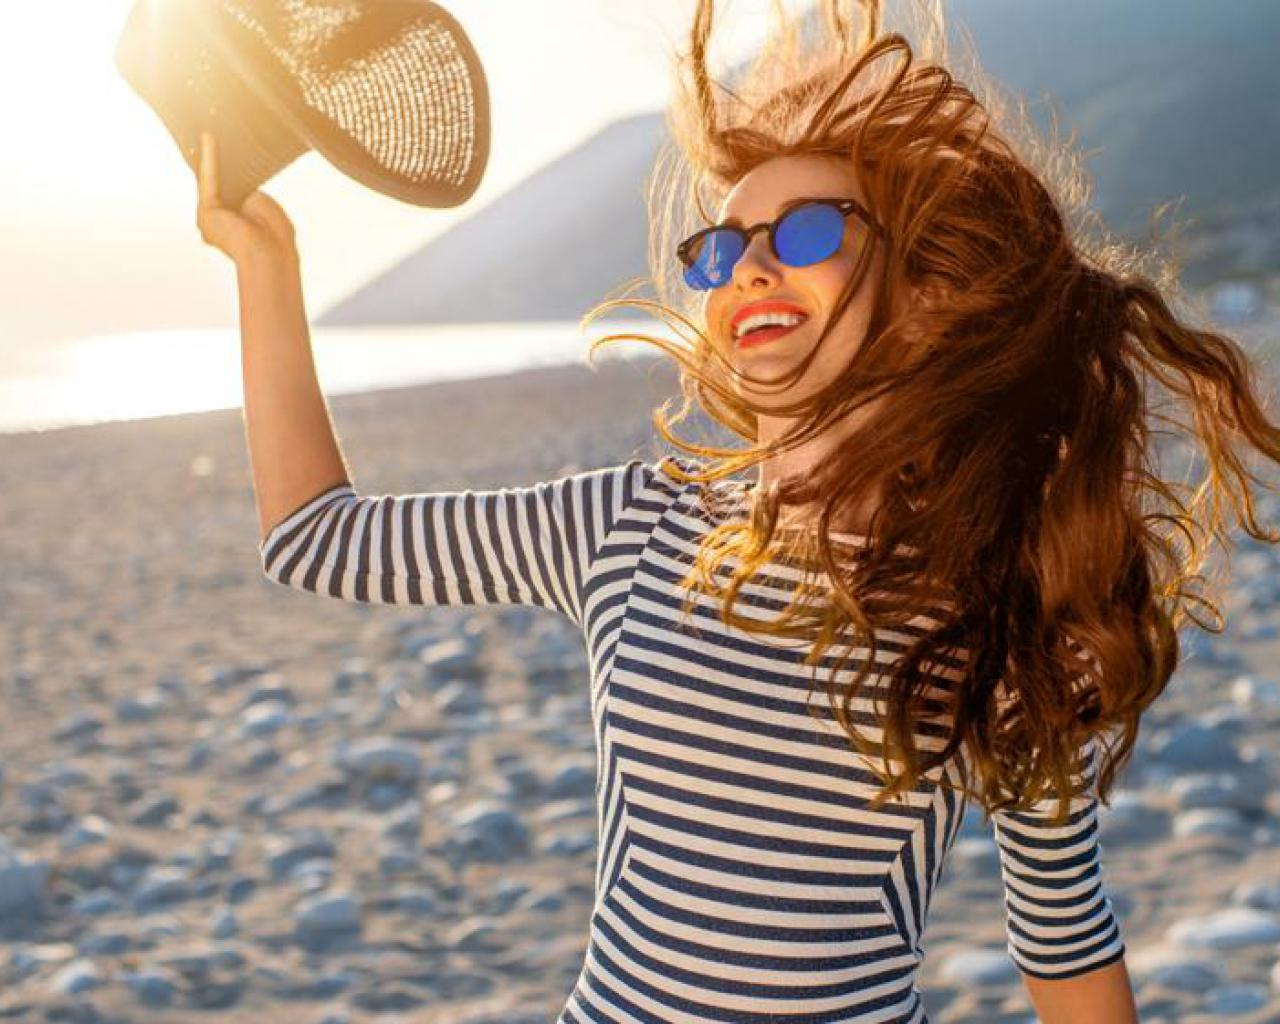 1b81a8c044 ¿Sabés cómo proteger tus ojos del sol de verano? - ElSol.com.ar - Diario de  Mendoza, Argentina - El Sol Online